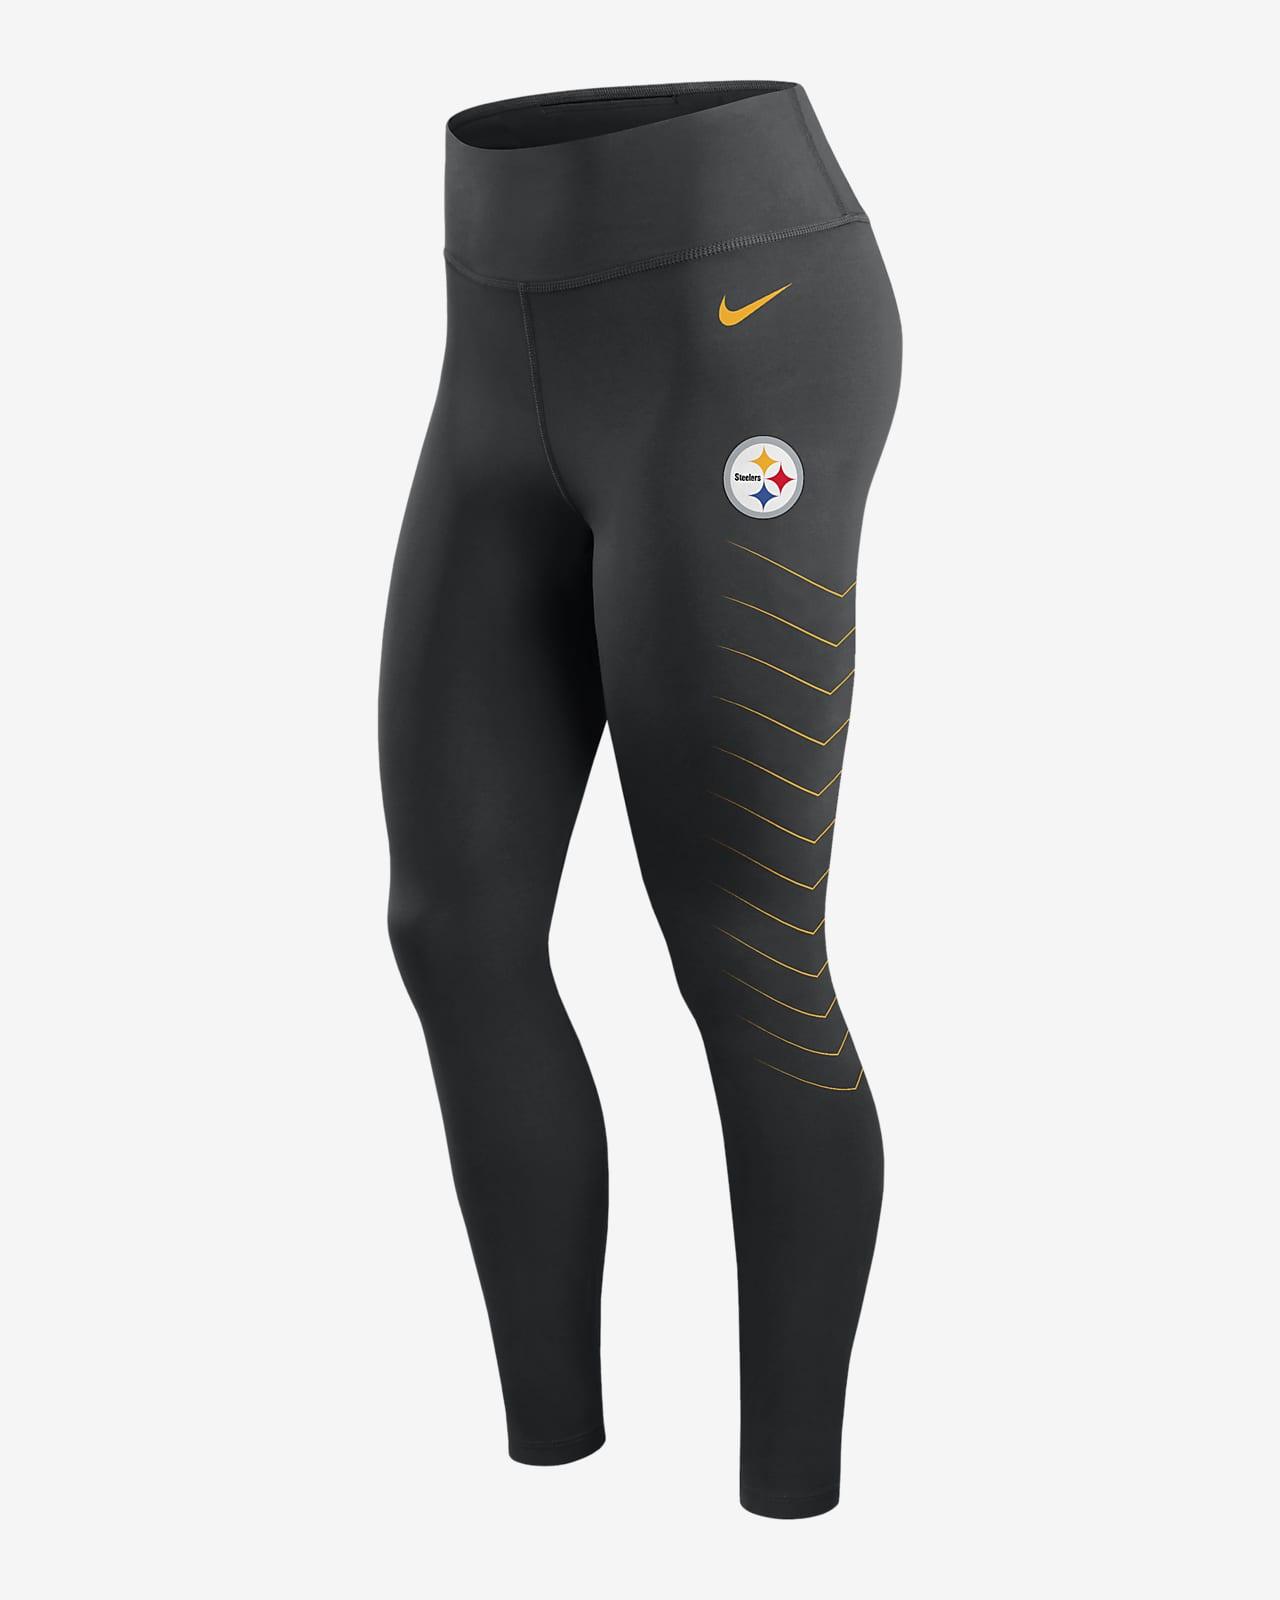 Nike Dri-FIT (NFL Pittsburgh Steelers) Women's Leggings